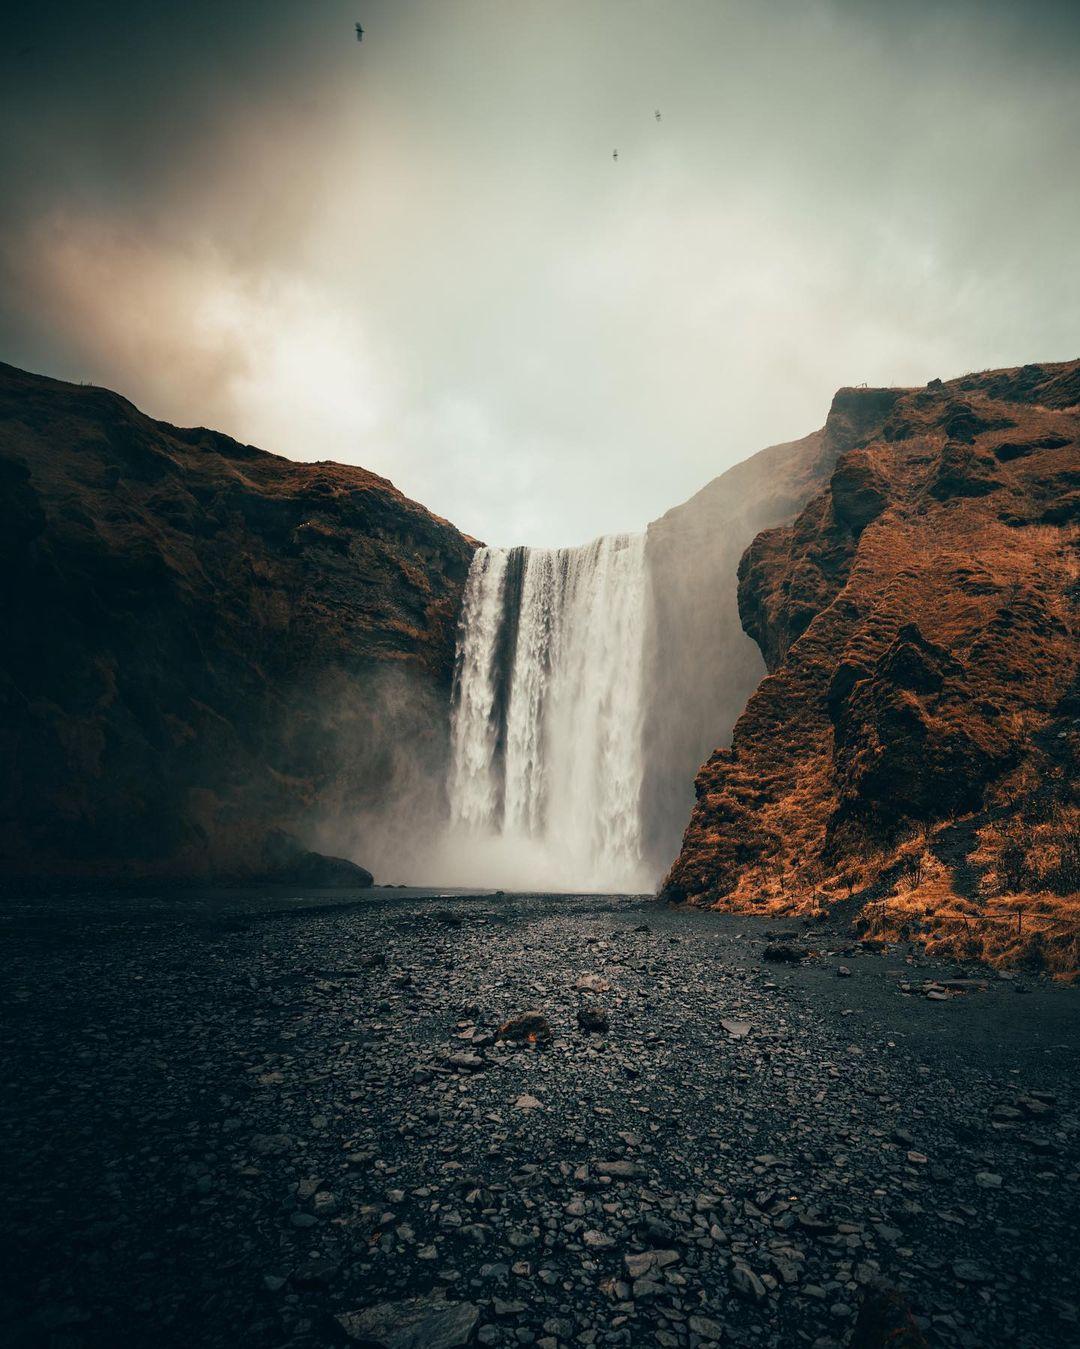 Путешествия и приключения на снимках Питера Маккиннона